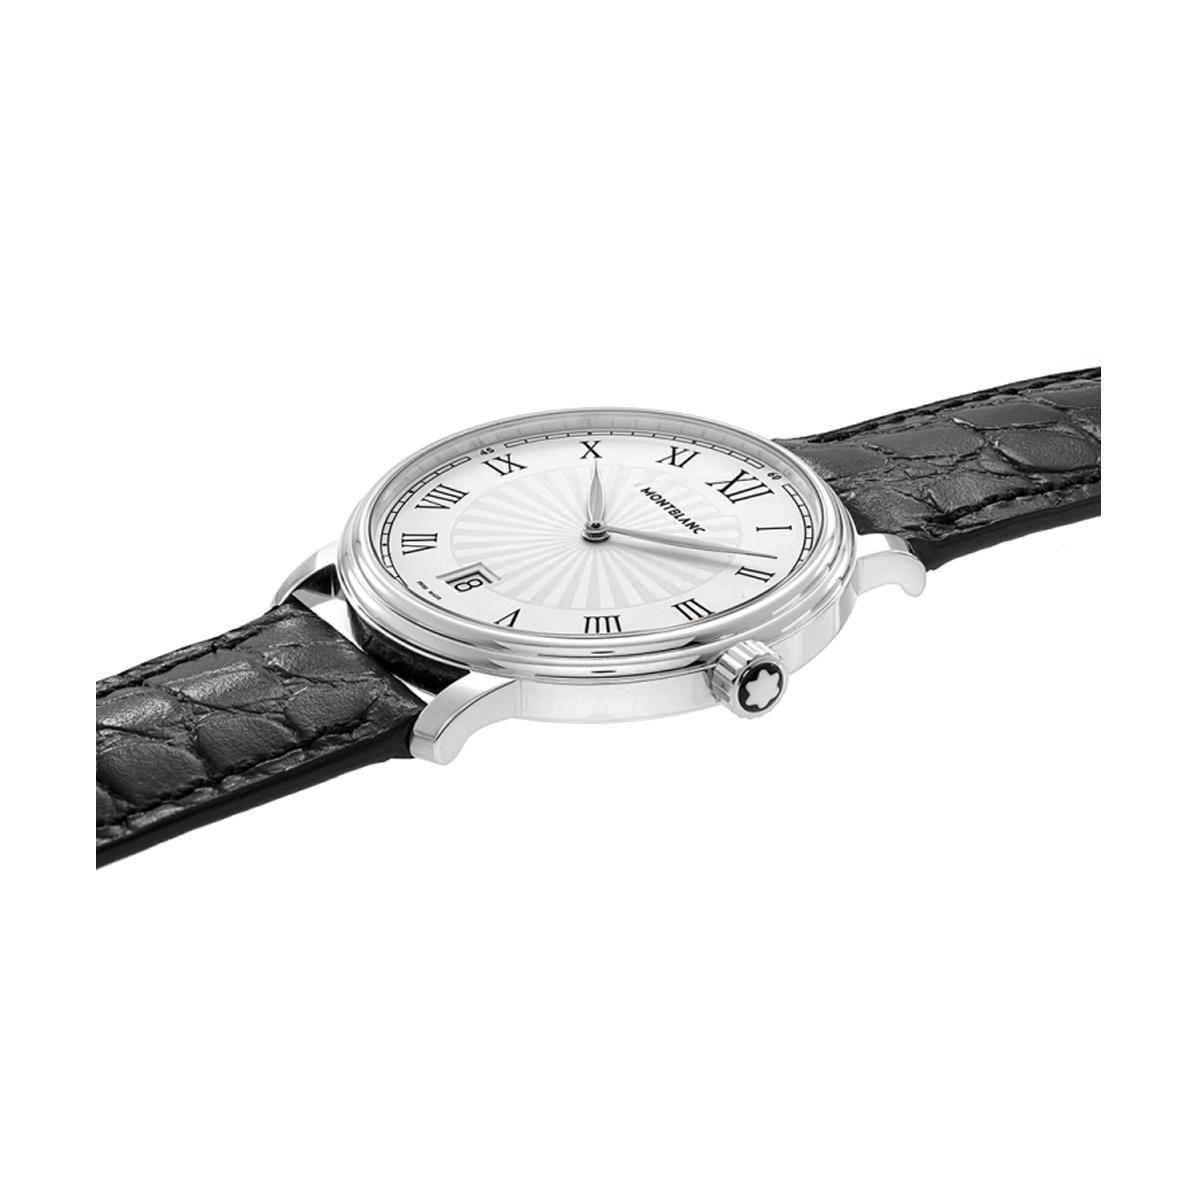 fd5bdf39508 Relógio Montblanc Tradition Date